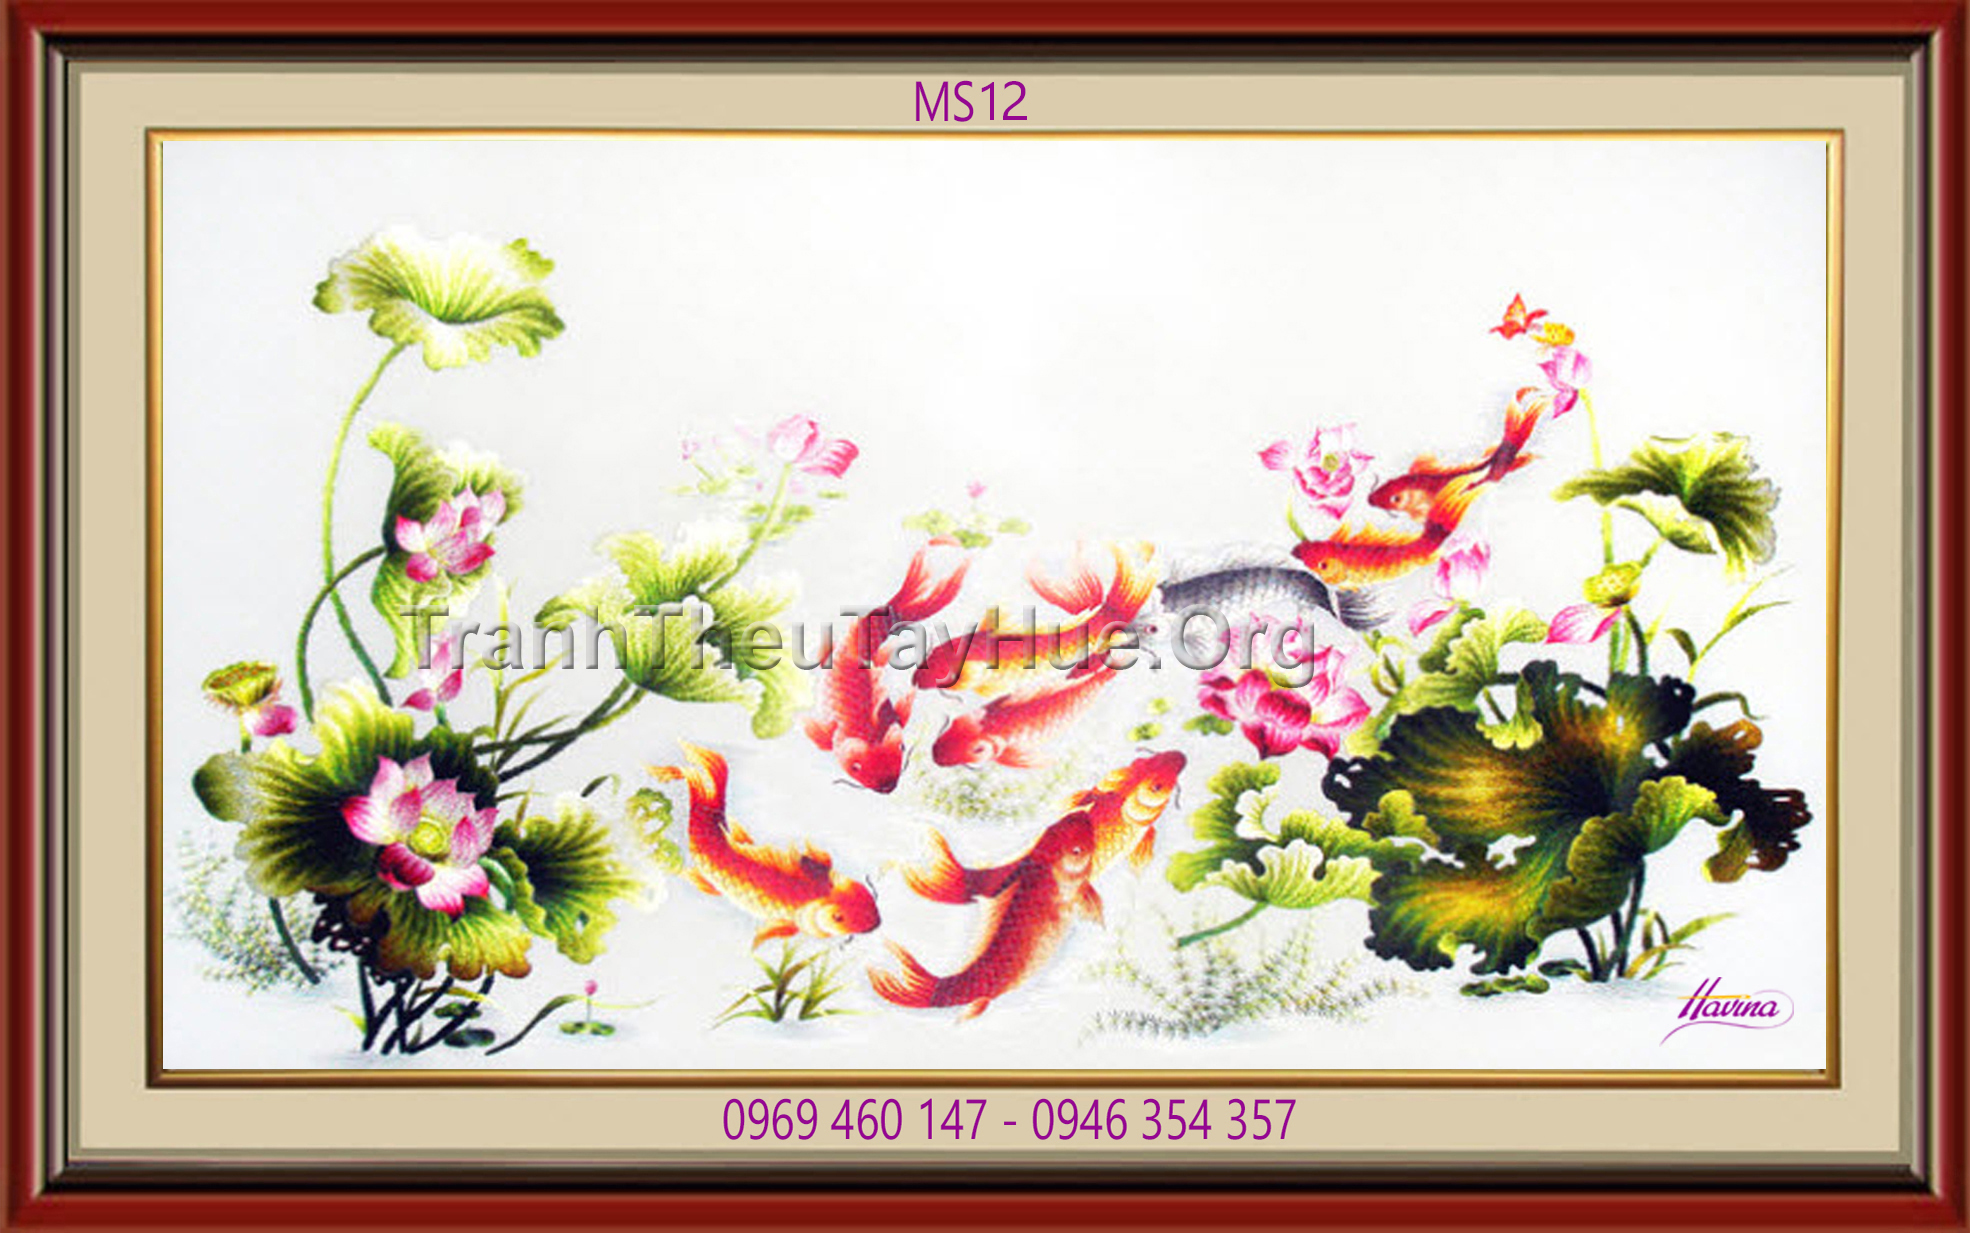 tranh-theu-ca-chep-hoa-sen-12_master